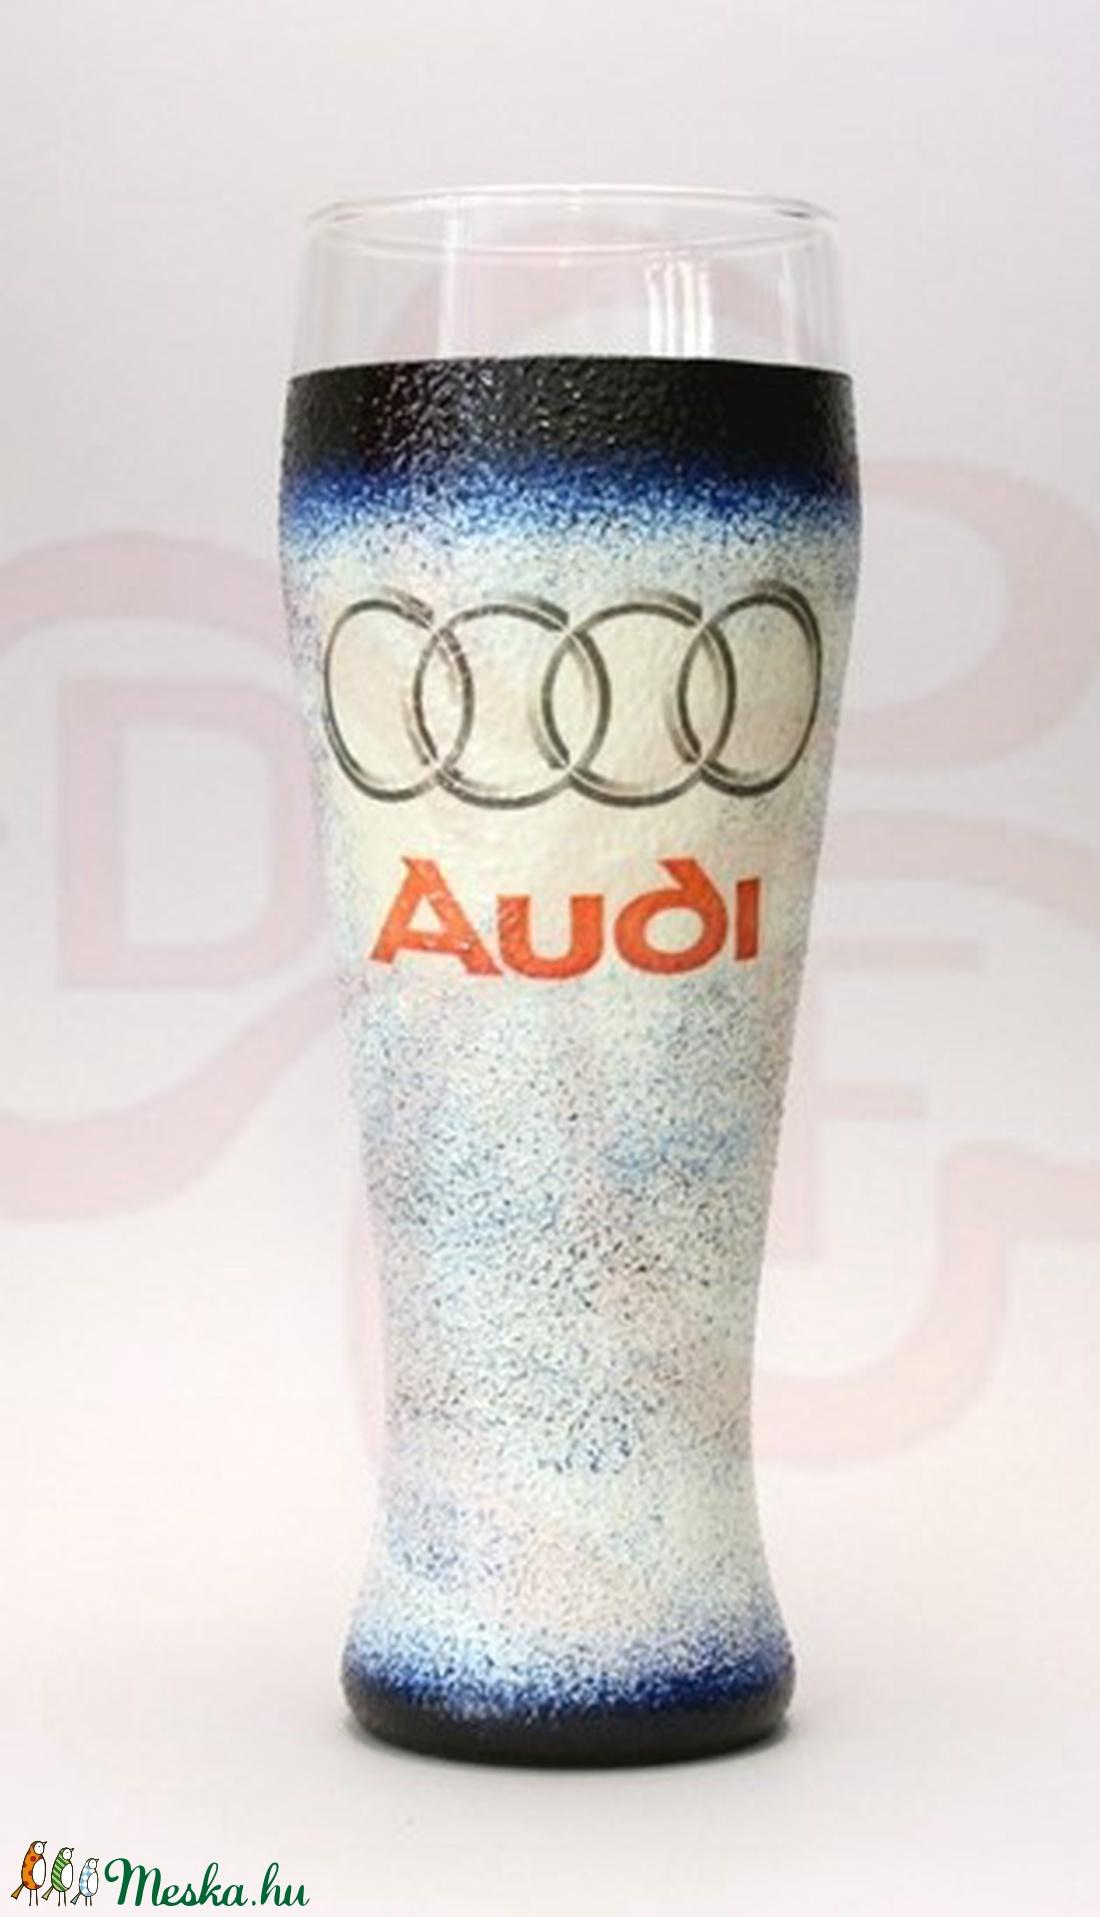 Audi söröspohár ; Audi rajongóknak (decorfantasy) - Meska.hu